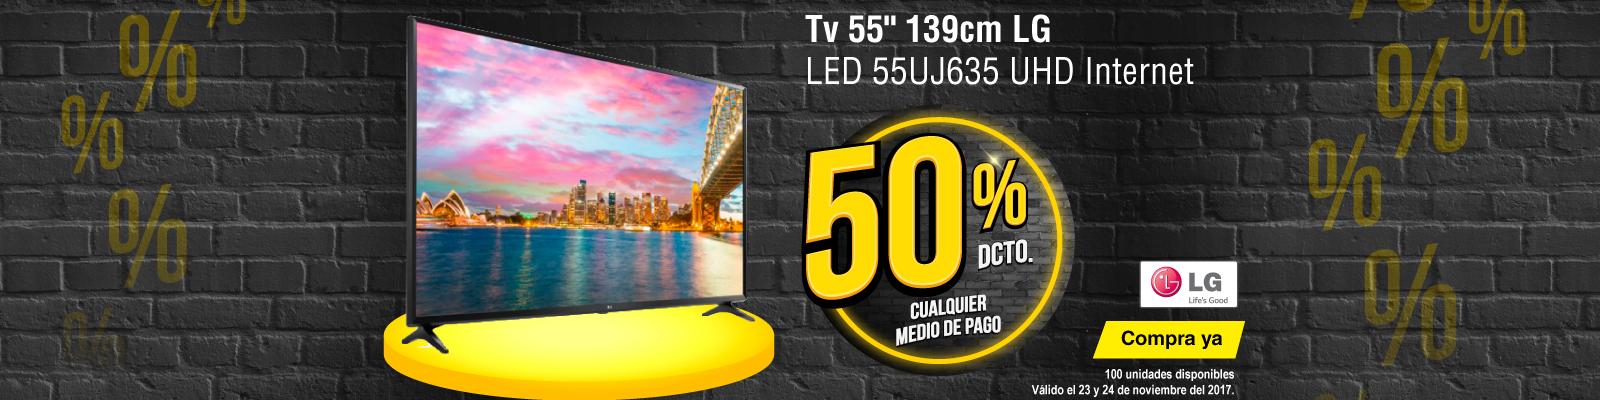 TOP PROMO ALKP-1-tv-Tv 55 139cm LG LED 55UJ635 UHD Internet-prod-noviembre23-24